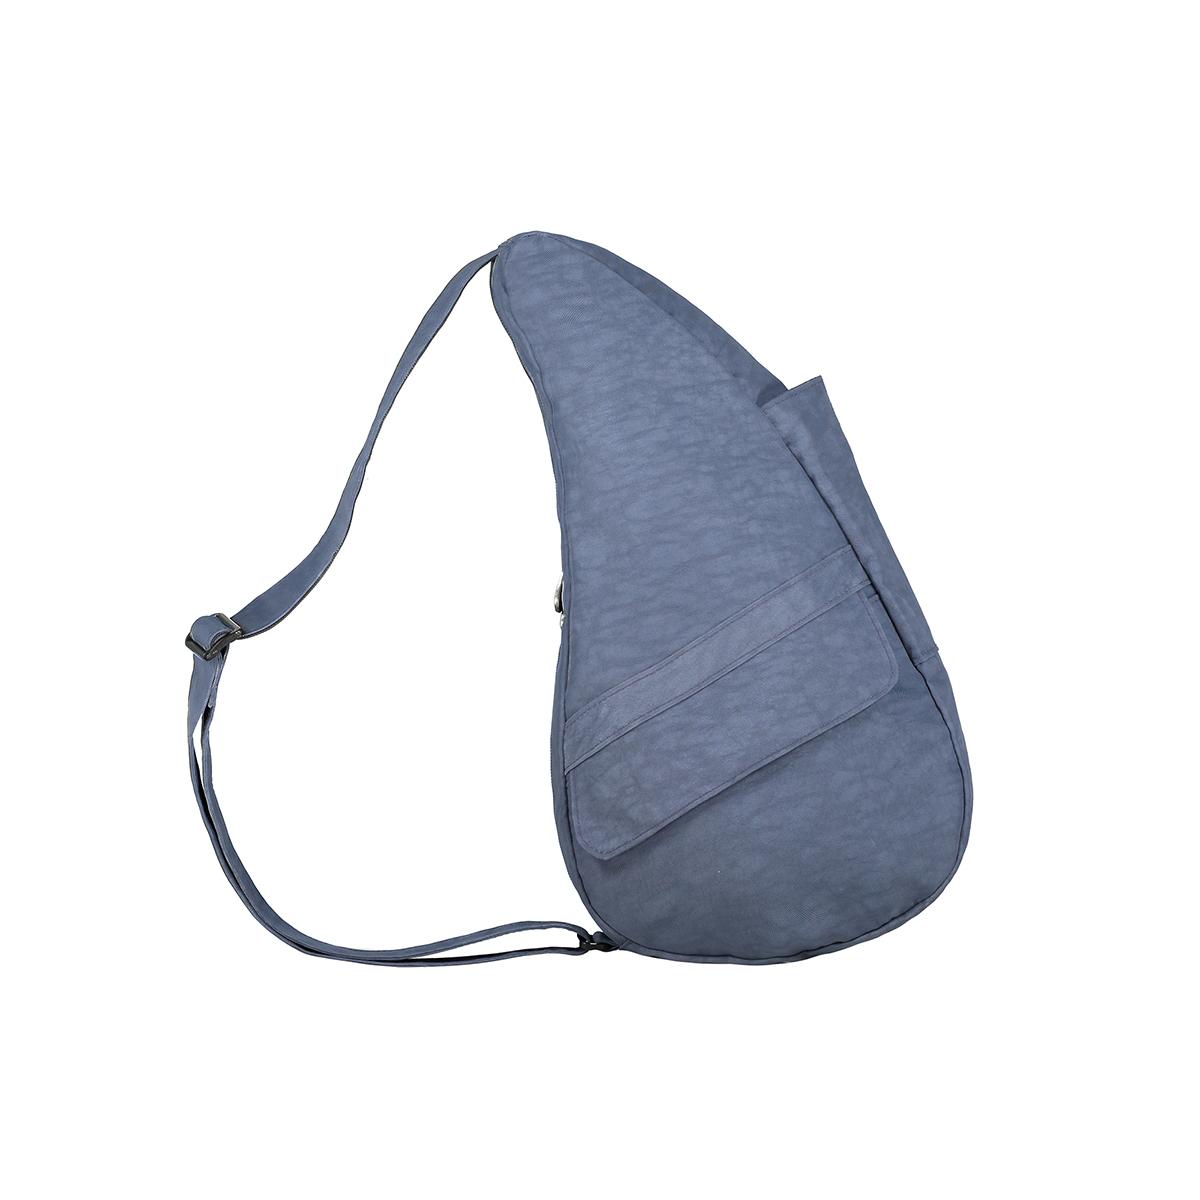 Healthy Back Bag/ヘルシーバックバッグ/ショルダーバッグ/ボディバッグ/旅行バッグ/軽量/レディース/メンズ 《限定ポーチ付》 公式ストア ヘルシーバックバッグ テクスチャードナイロン Sサイズ ヴィンテージインディゴ